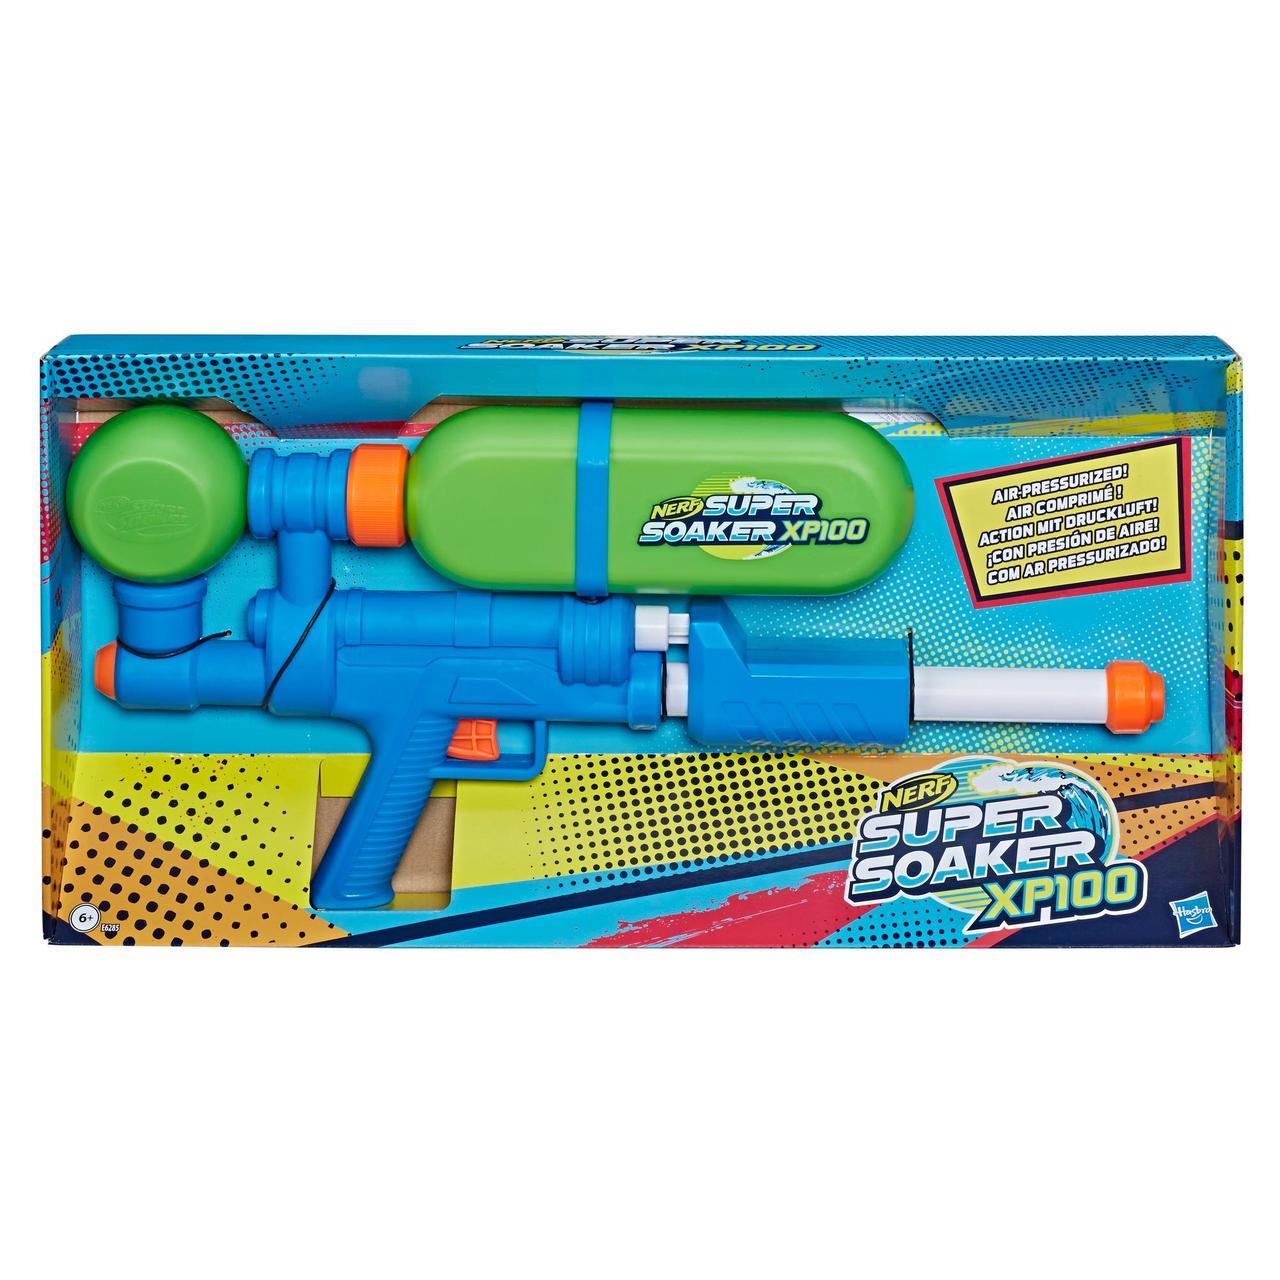 "Hasbro Nerf Super Soaker Водный бластер Суперсокер ""XP100"""